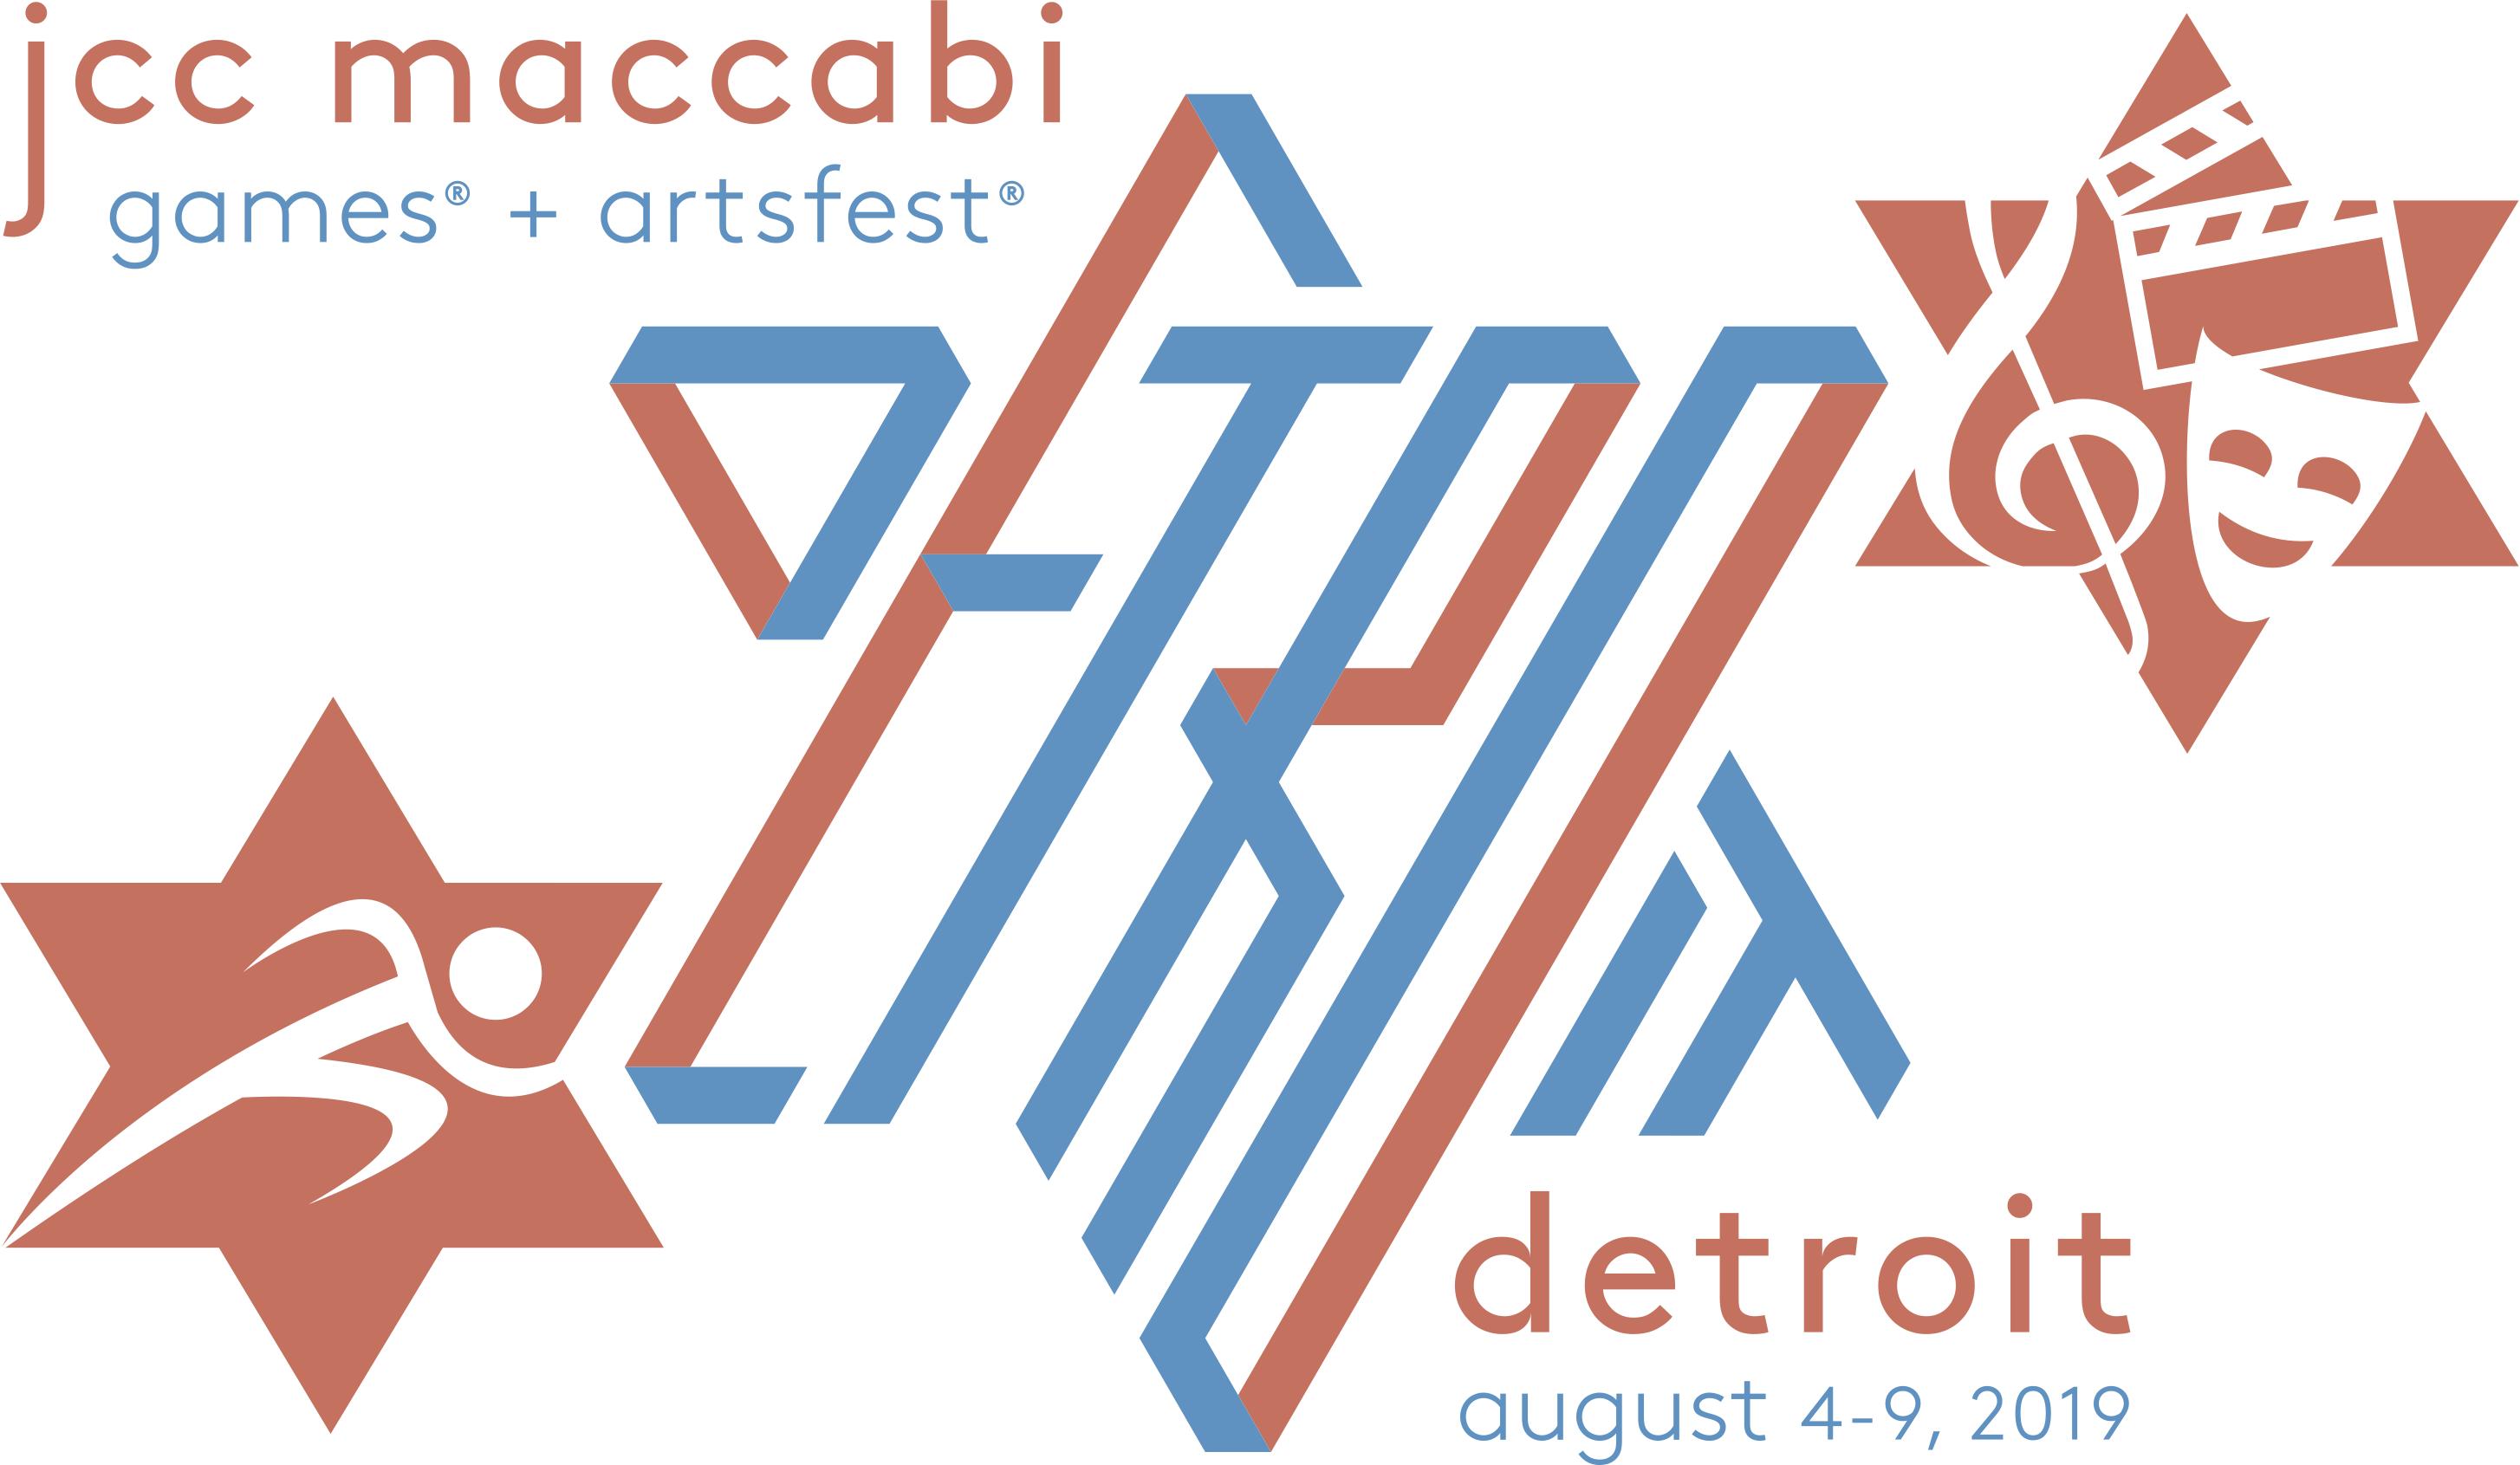 Maccabi-2019-Logos_maccabidetroit_orange_text